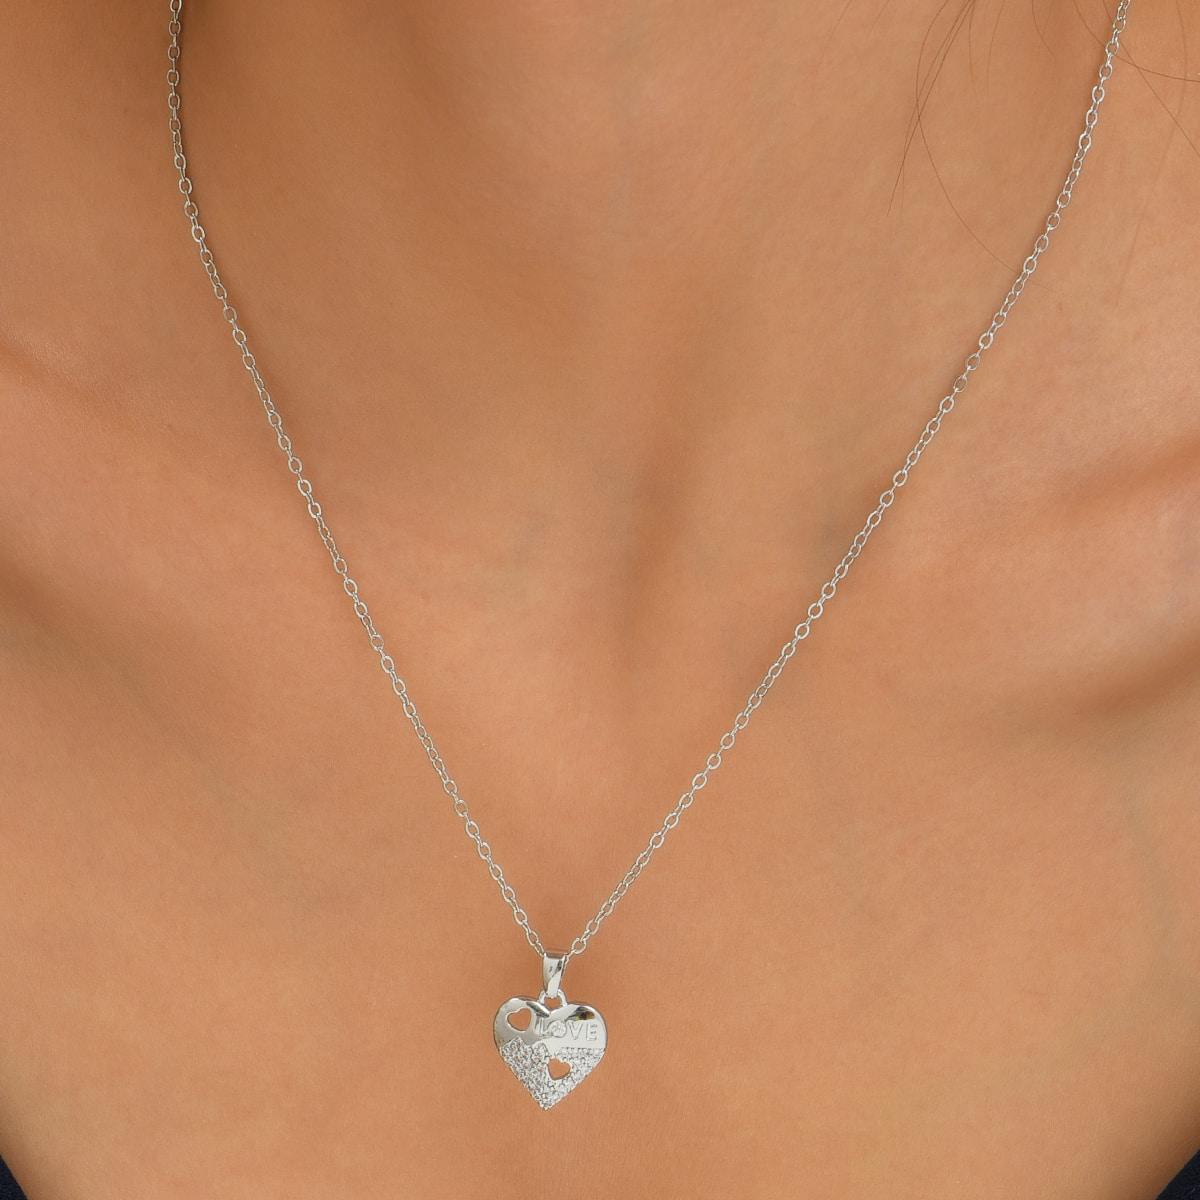 - Zircon Heart Charm Necklace